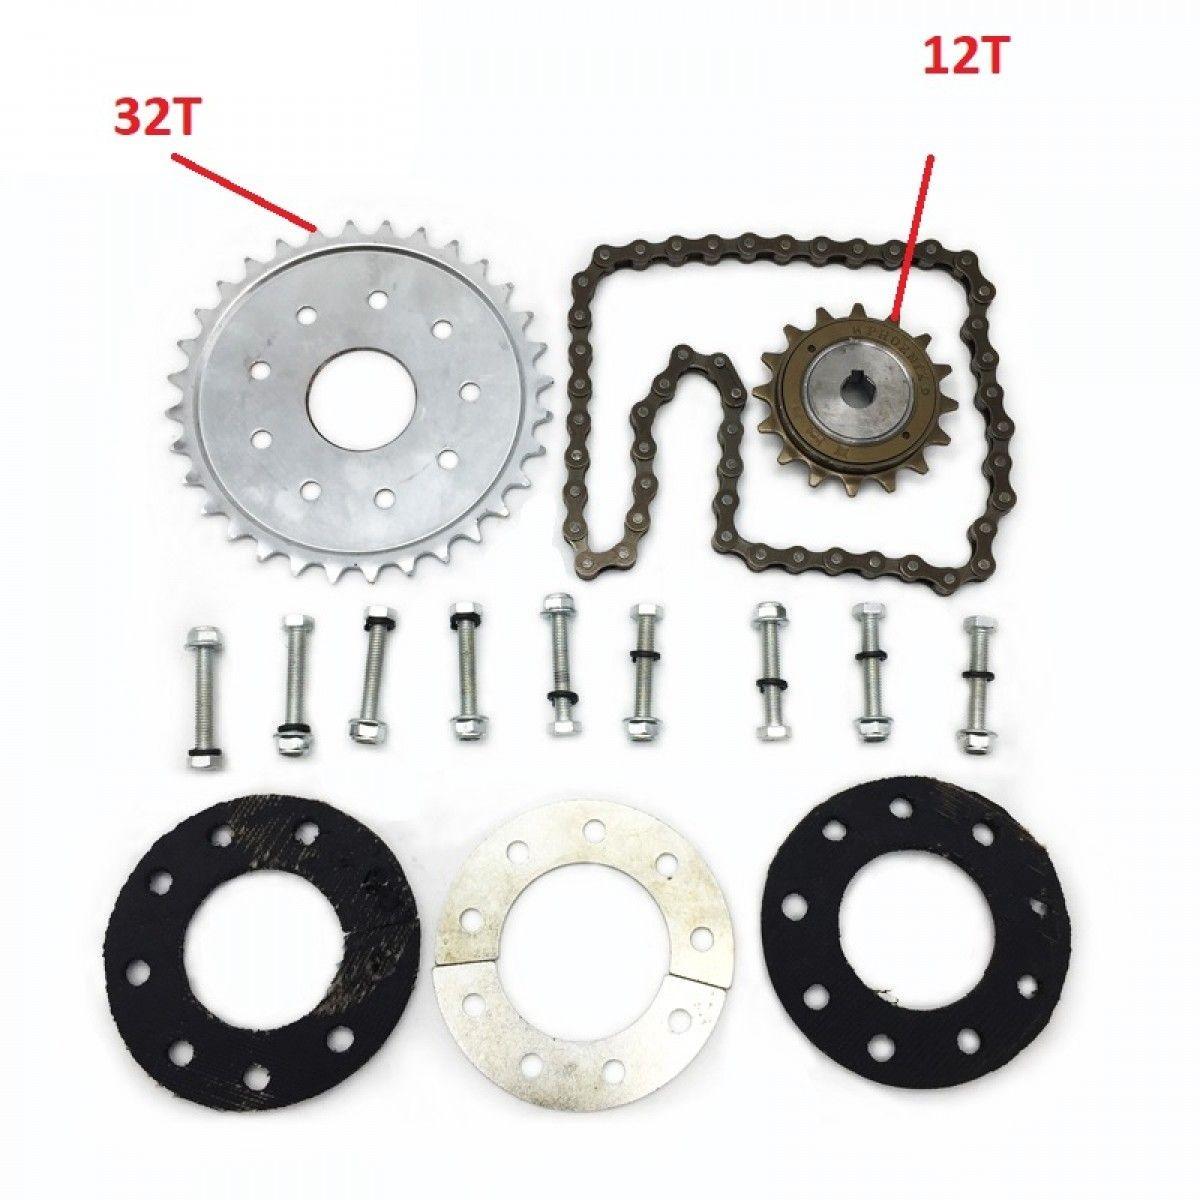 Moped ZT-35 49cc pedale fara carnet